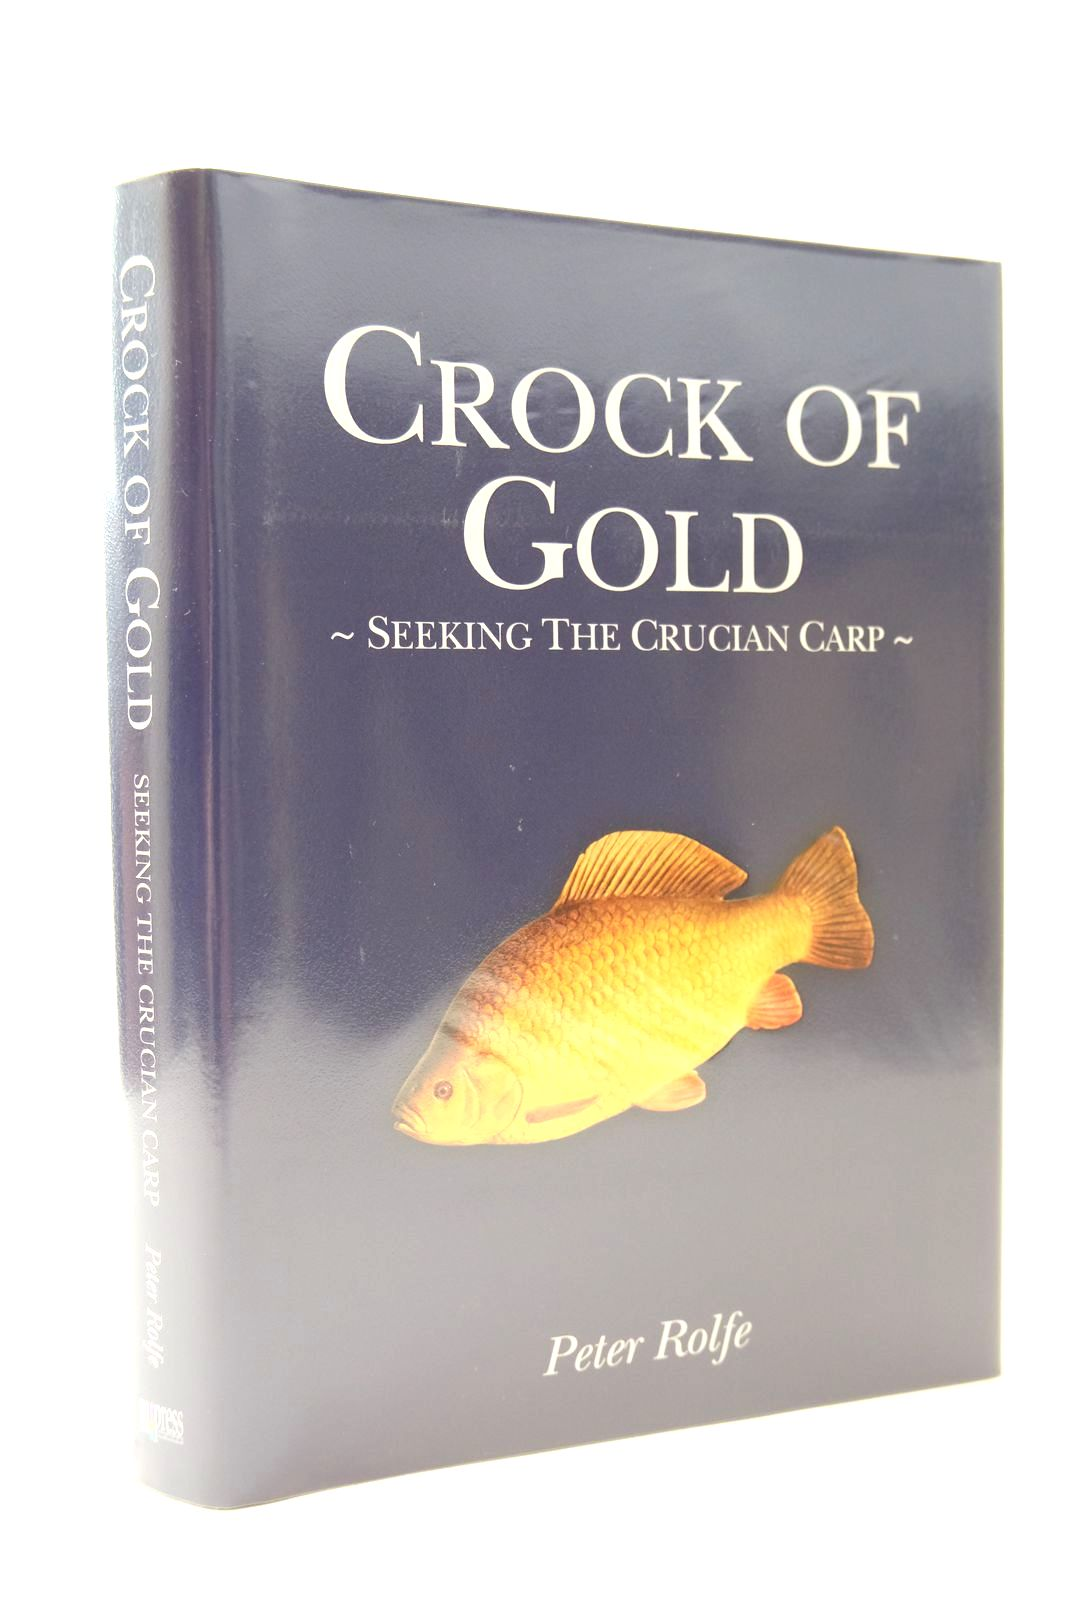 Photo of CROCK OF GOLD SEEKING THE CRUCIAN CARP- Stock Number: 2131844